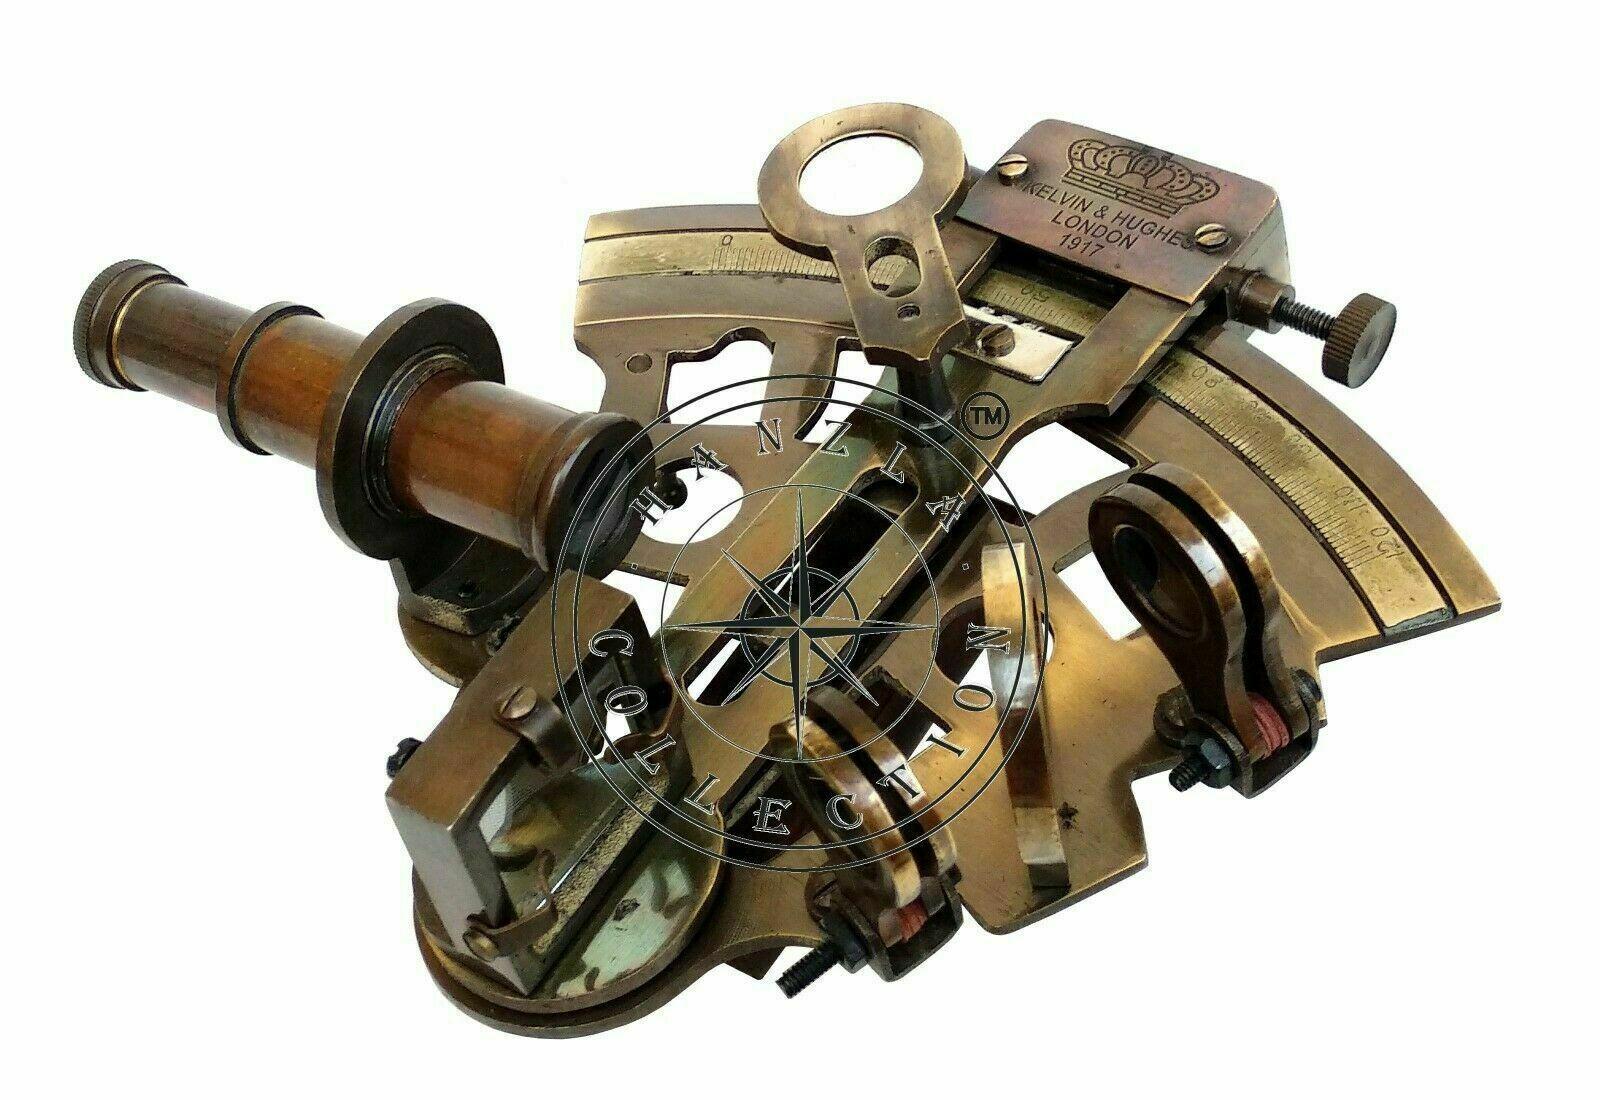 Купить Antique Brass Working Marine Sextant Collectible Vintage Nautical Ship Astrolabe